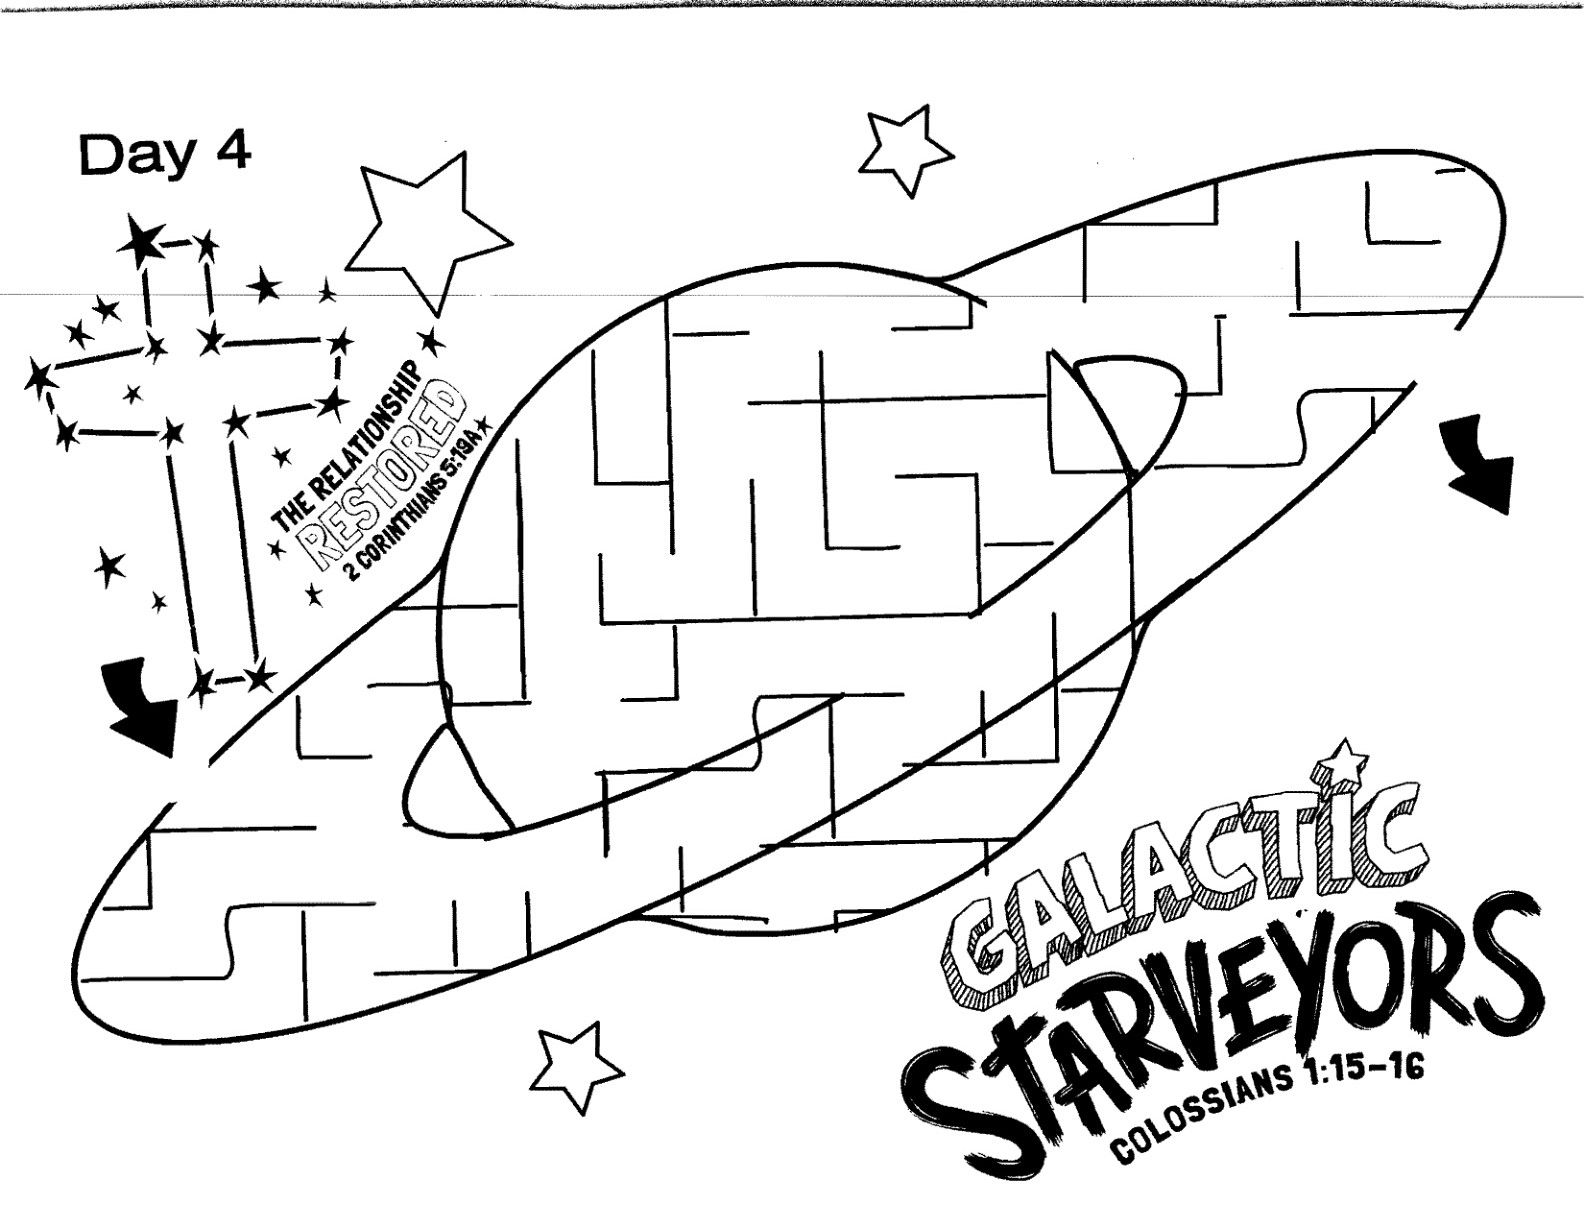 Galactic Starveyors Coloring Sheet Vbs